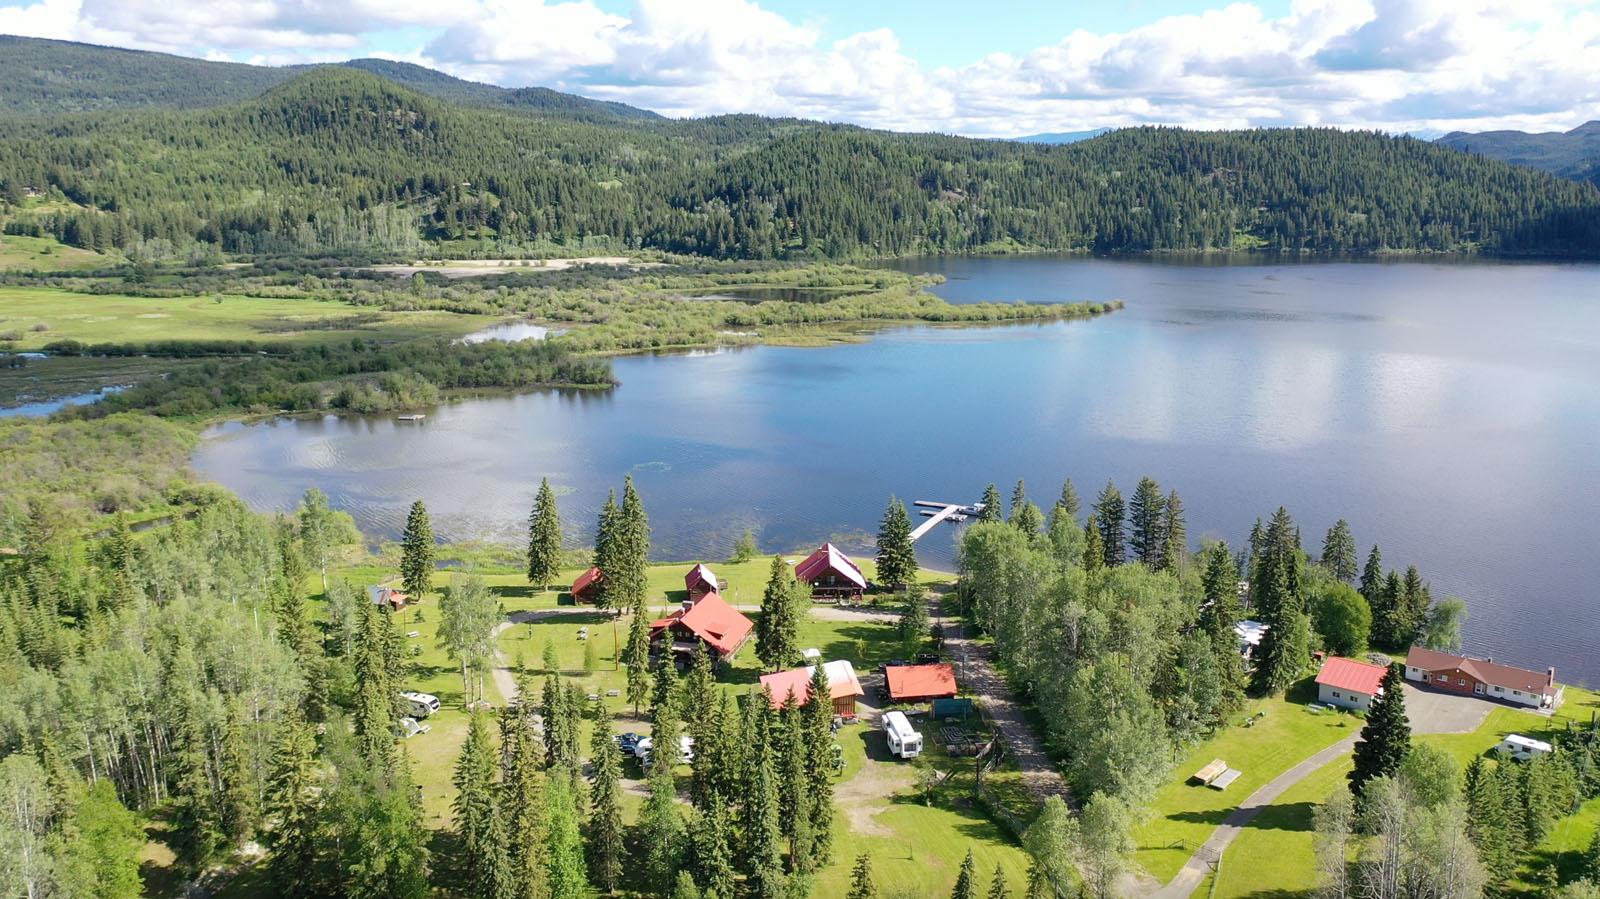 Canim lake resort 06